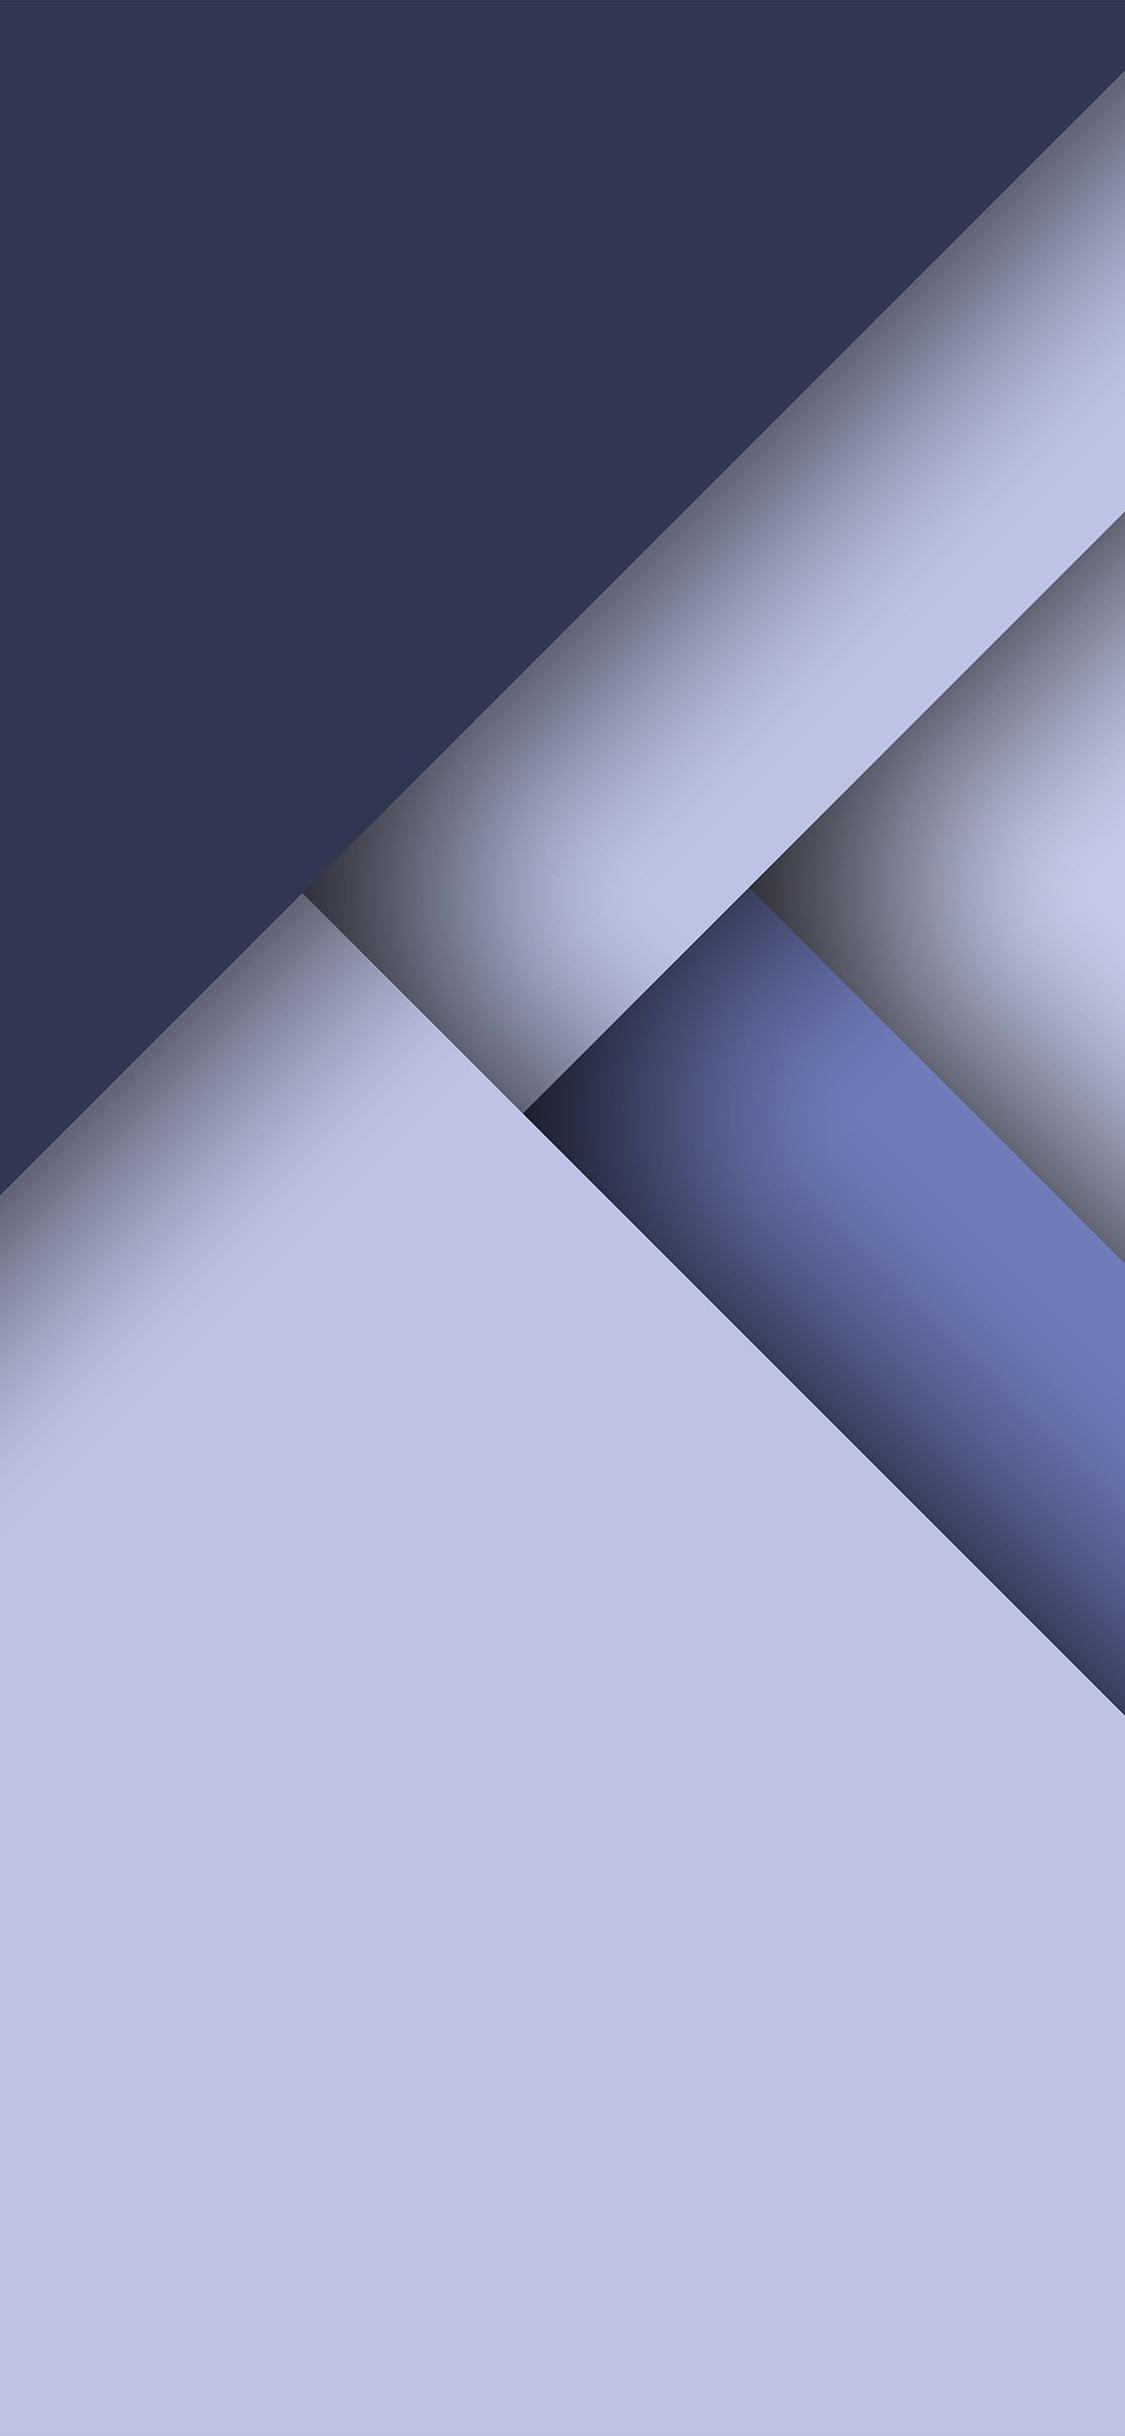 iPhoneXpapers.com-Apple-iPhone-wallpaper-vk85-lollipop-background-simple-flat-material-pattern